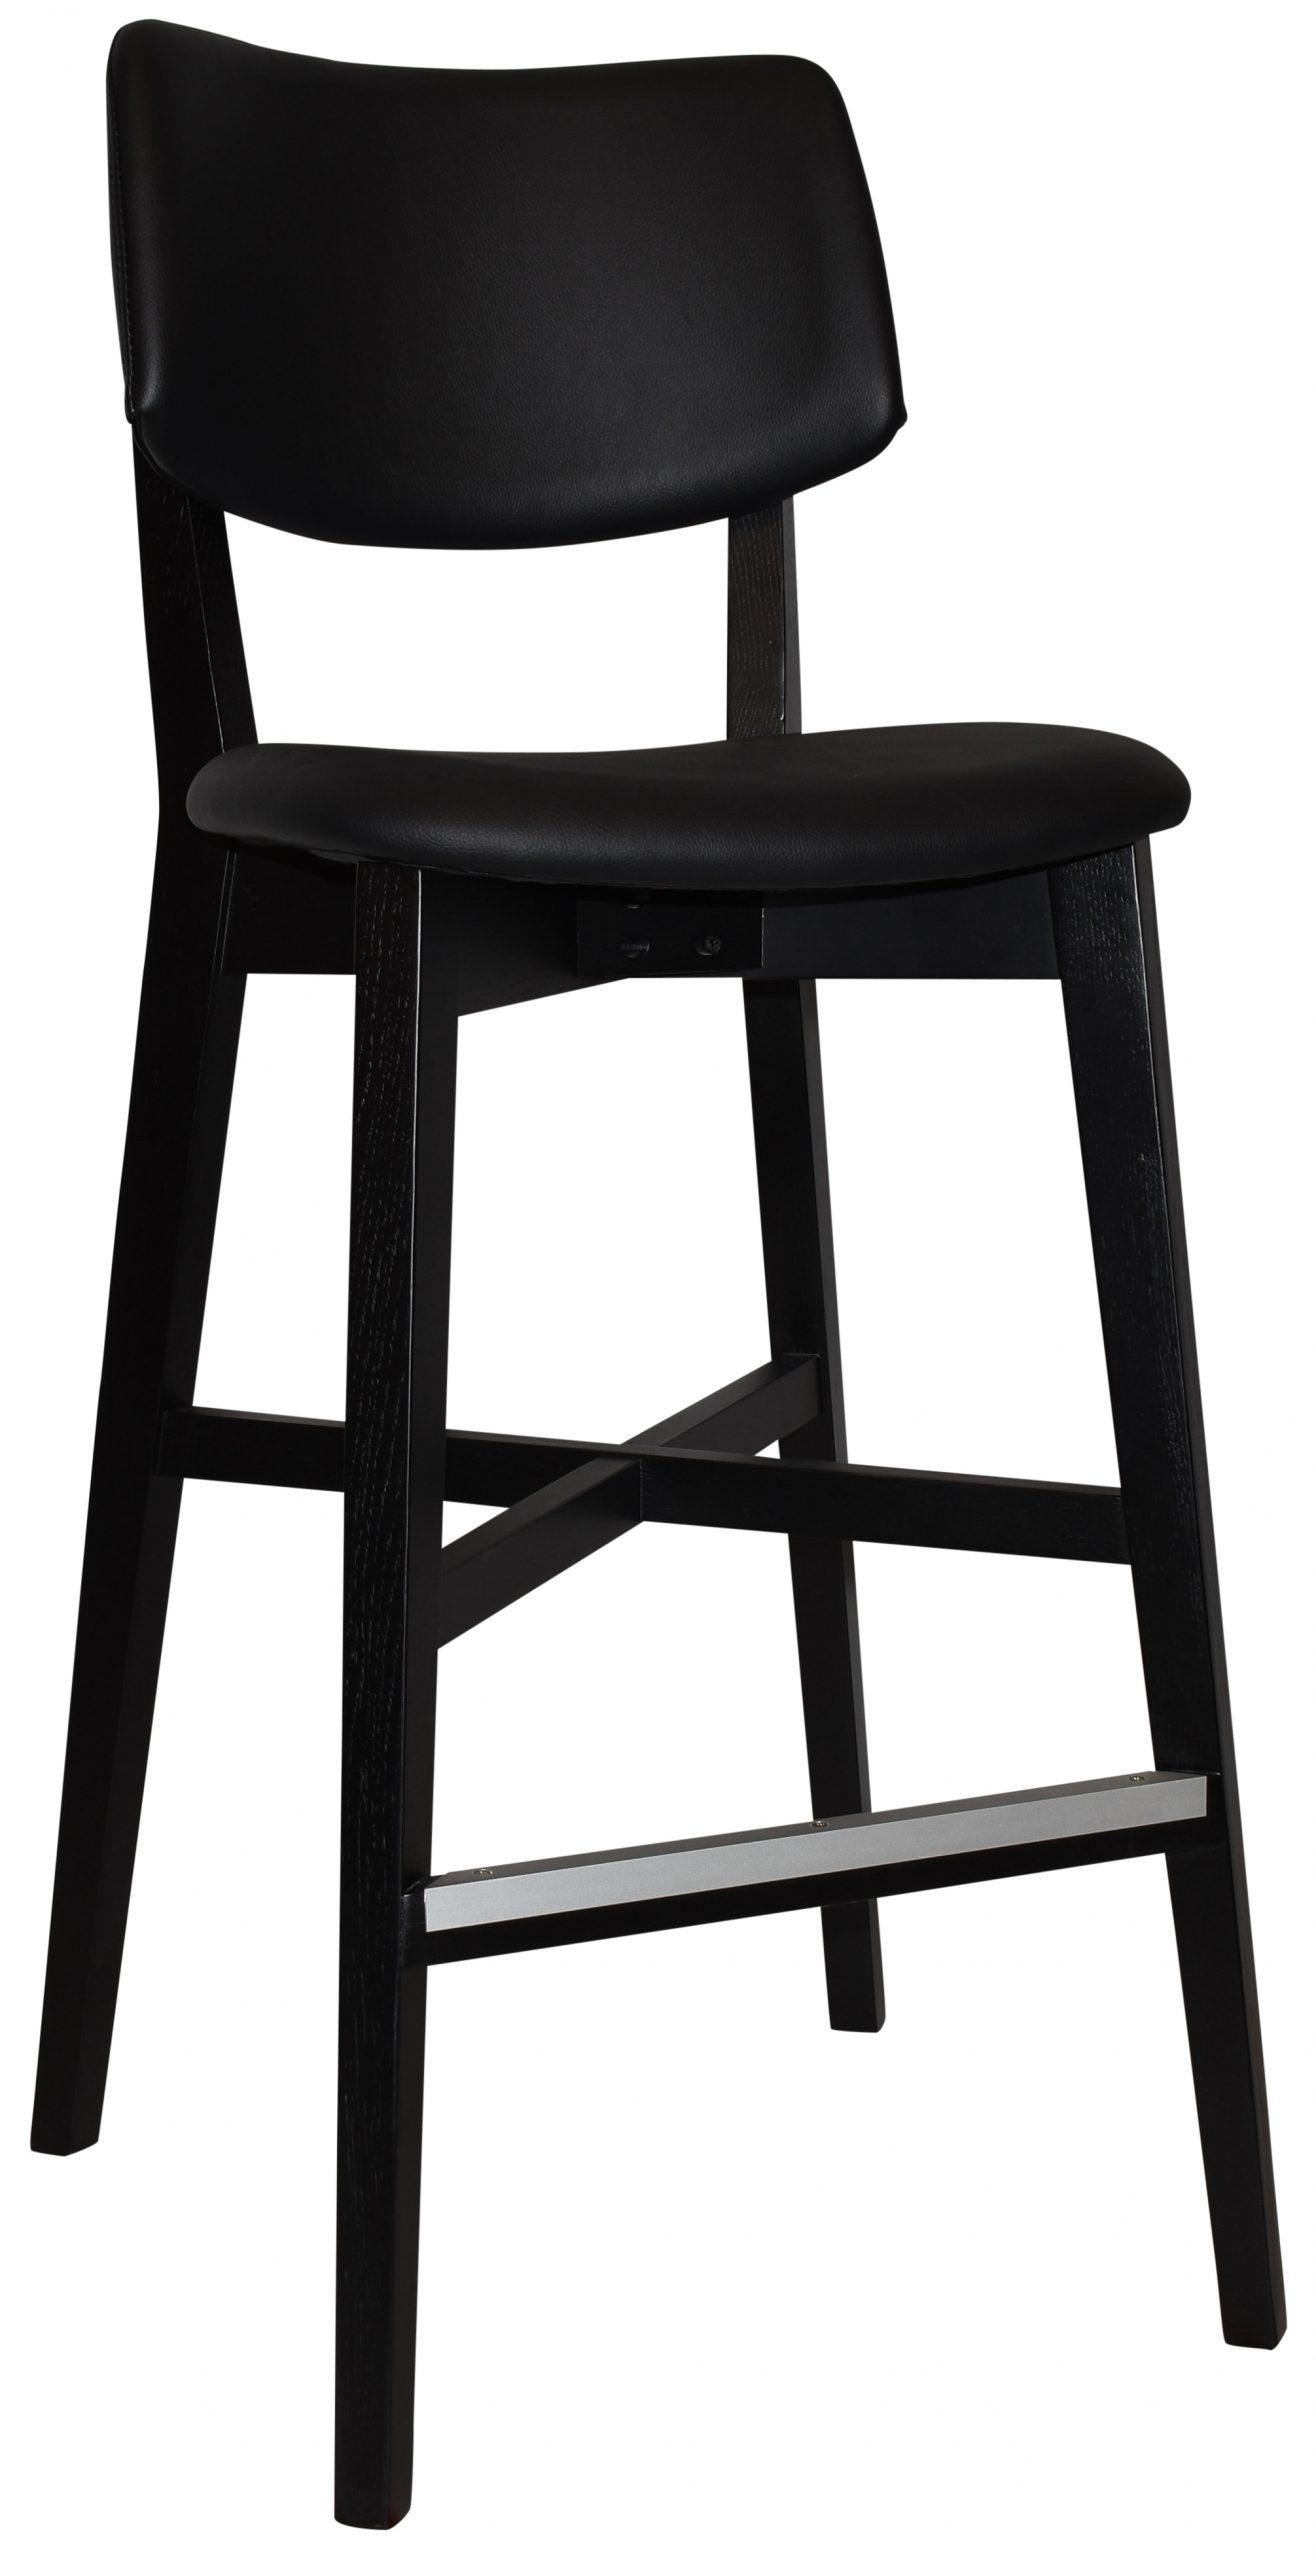 Phoenix 750mm stool